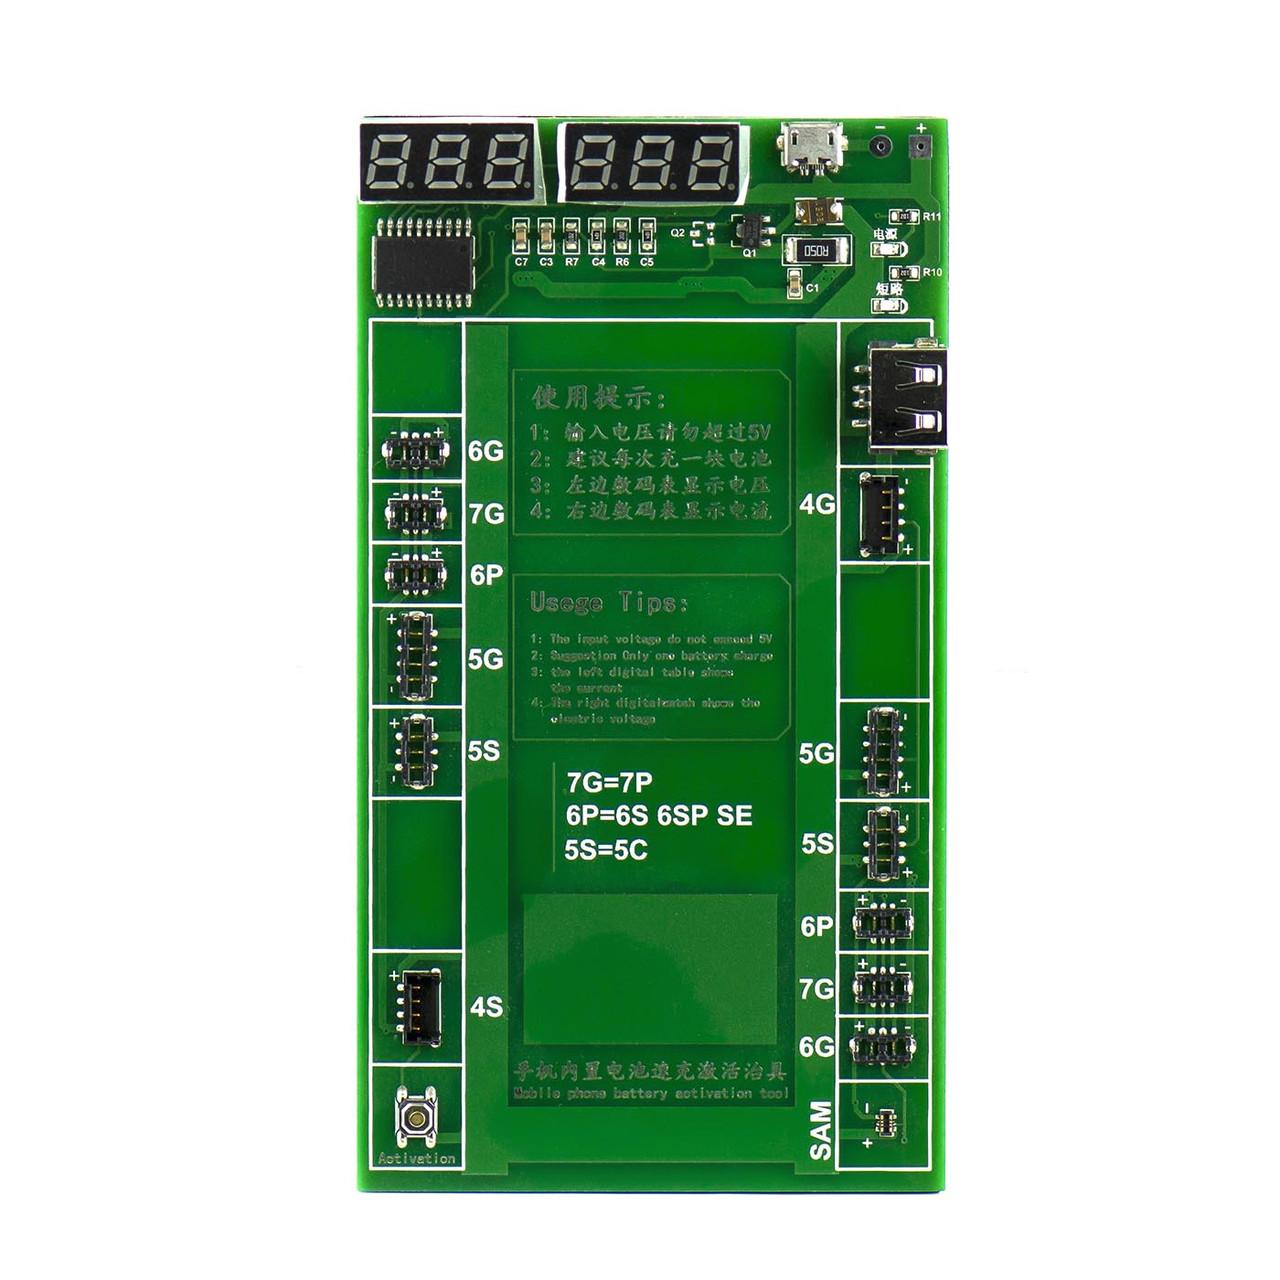 Активатор аккумулятора Dual Pro II M001 для Iphone 4G/4S/5G/5S/5SE/6G/6PLUS/6S/6SPLUS/7/7Plus